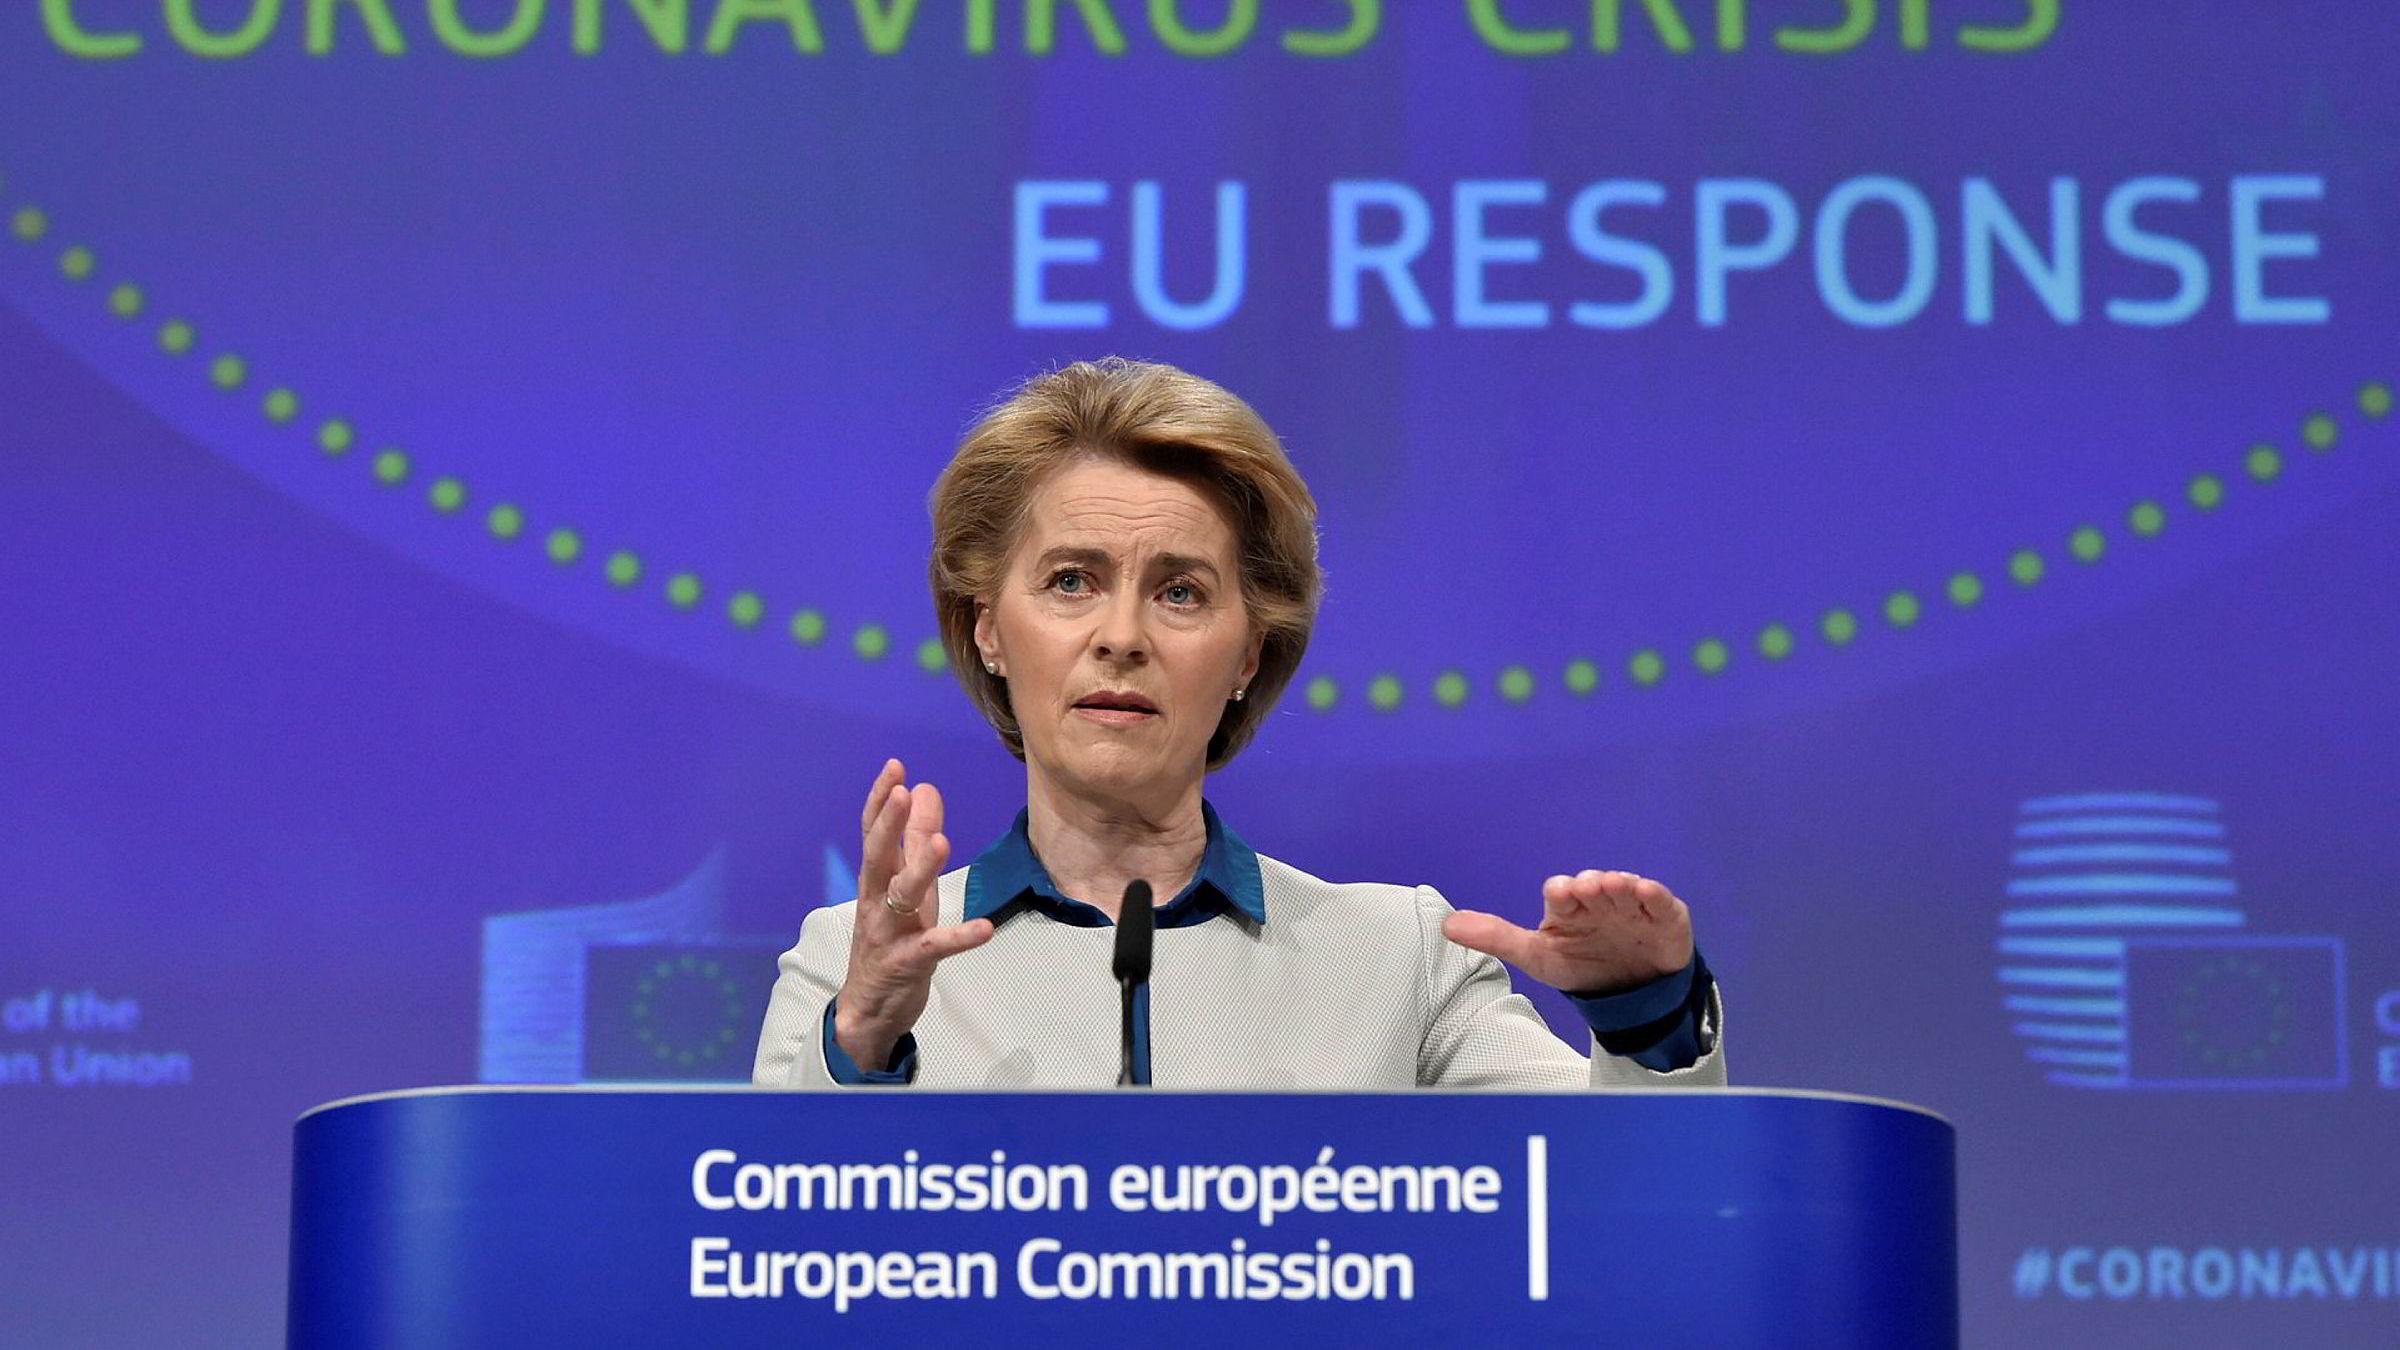 EU response